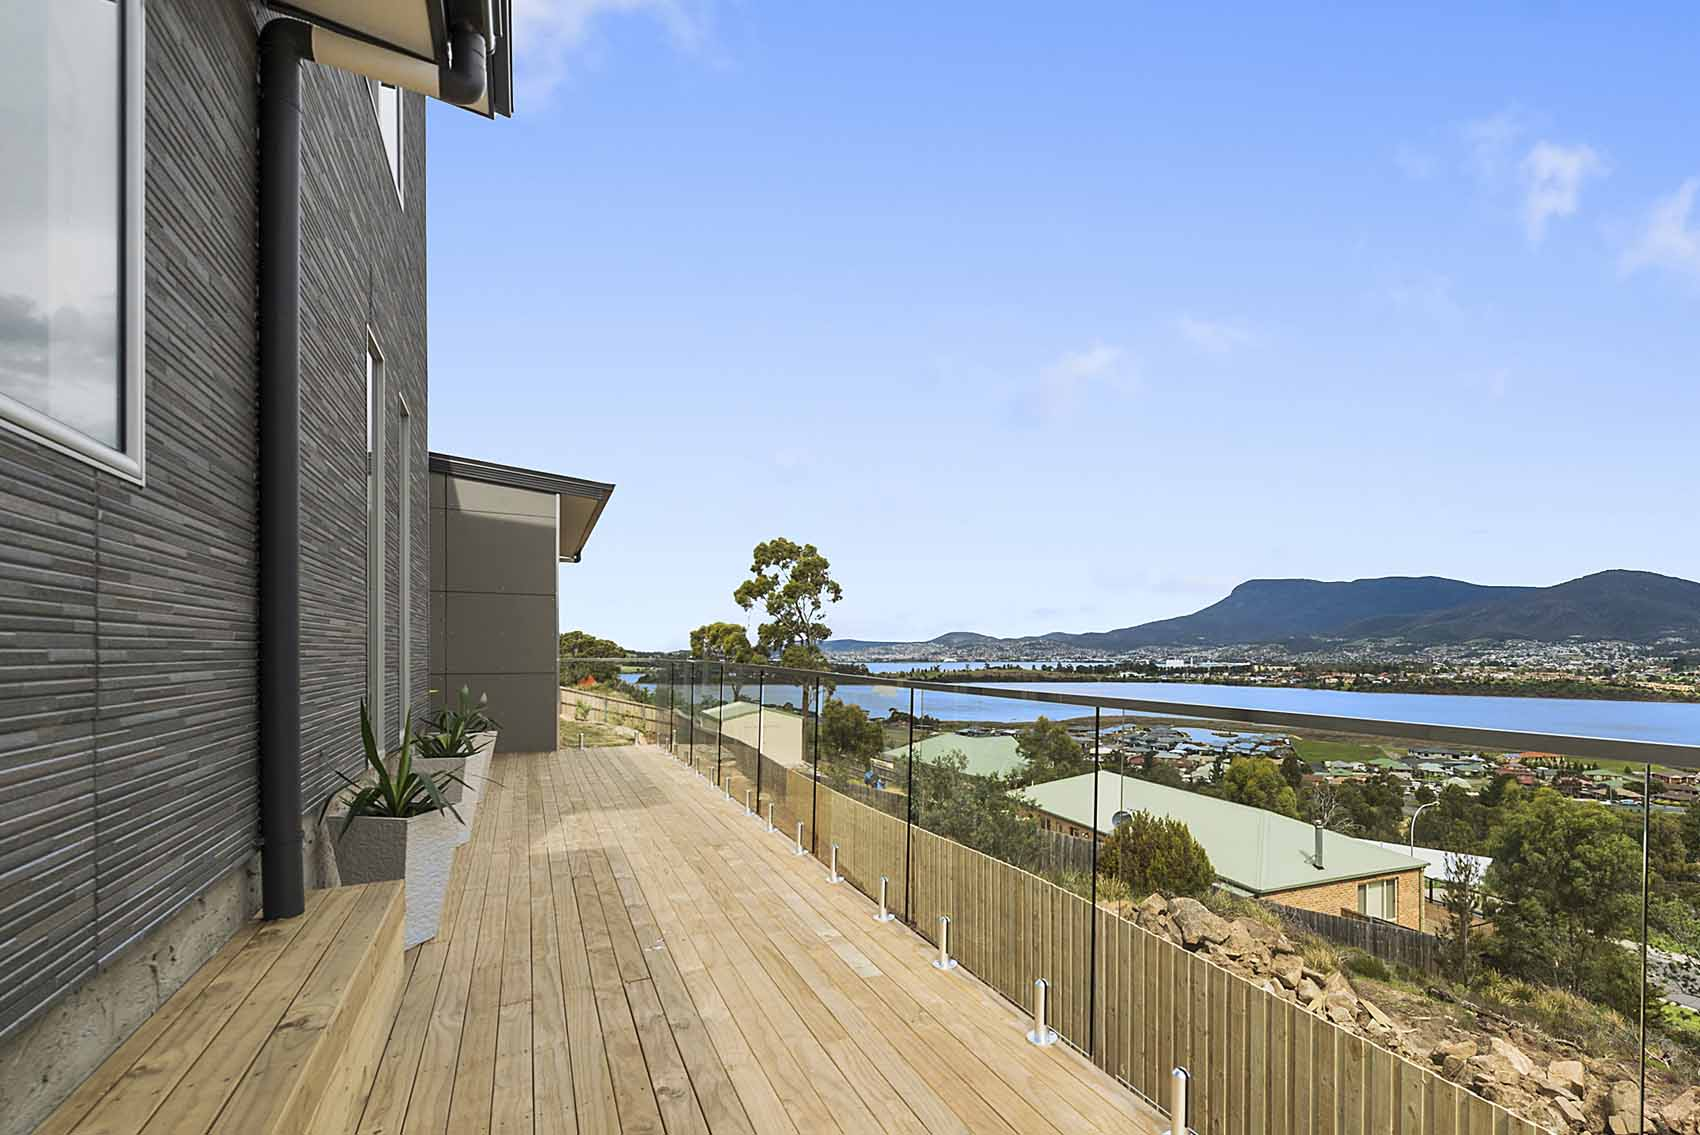 hobart-builders-321-build-tasmania-new-home-renovations-4